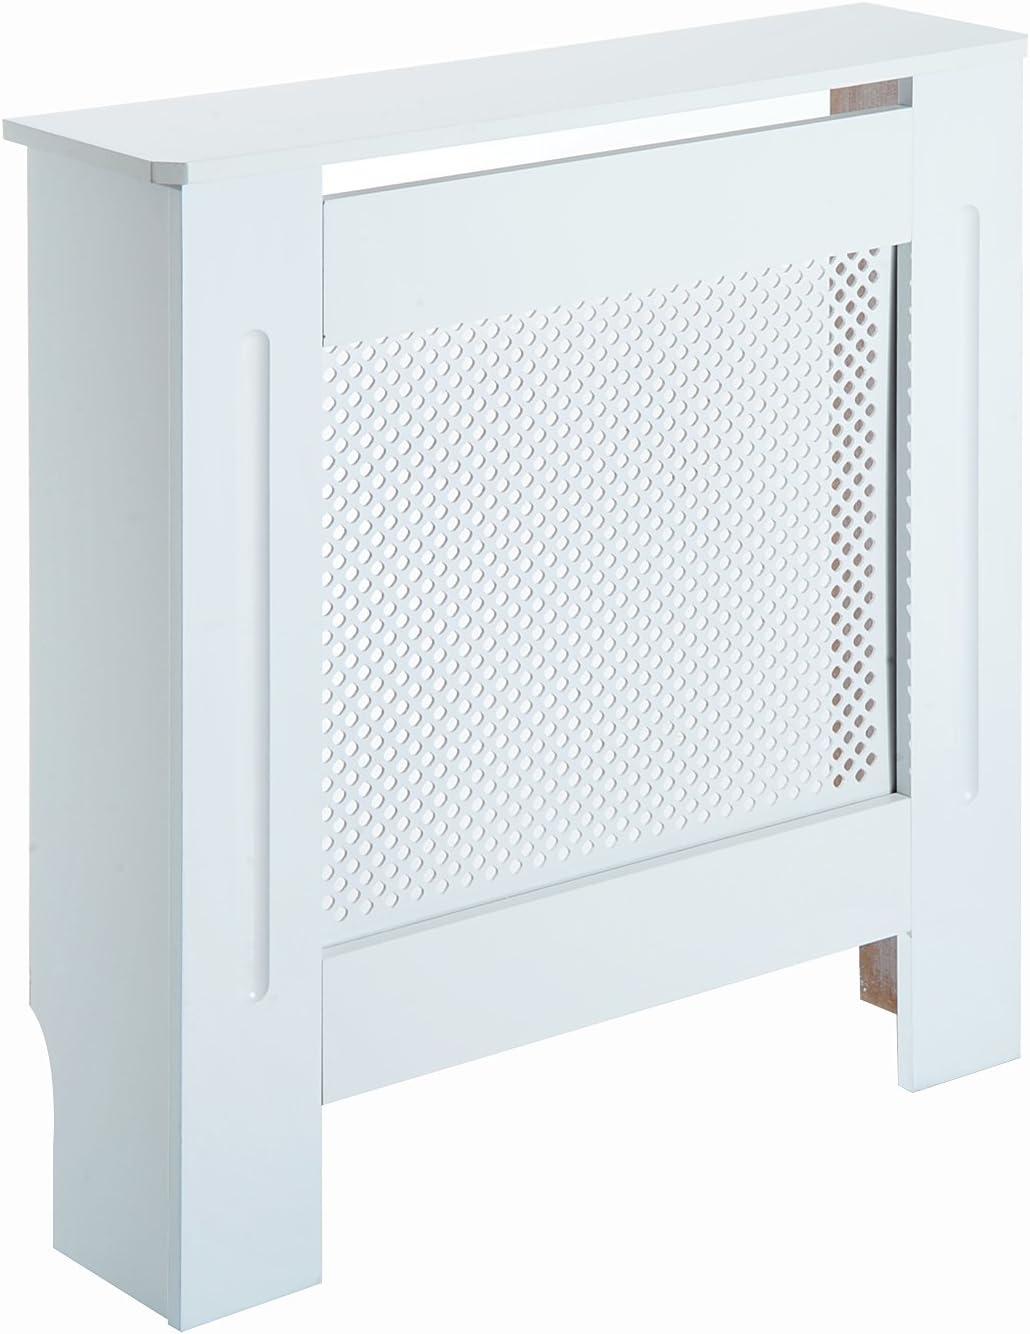 HOMCOM Cubre Radiador Cubierta de Radiador Mueble Estante de Pared para Radiador Diseño Moderno MDF 78x19x82cm